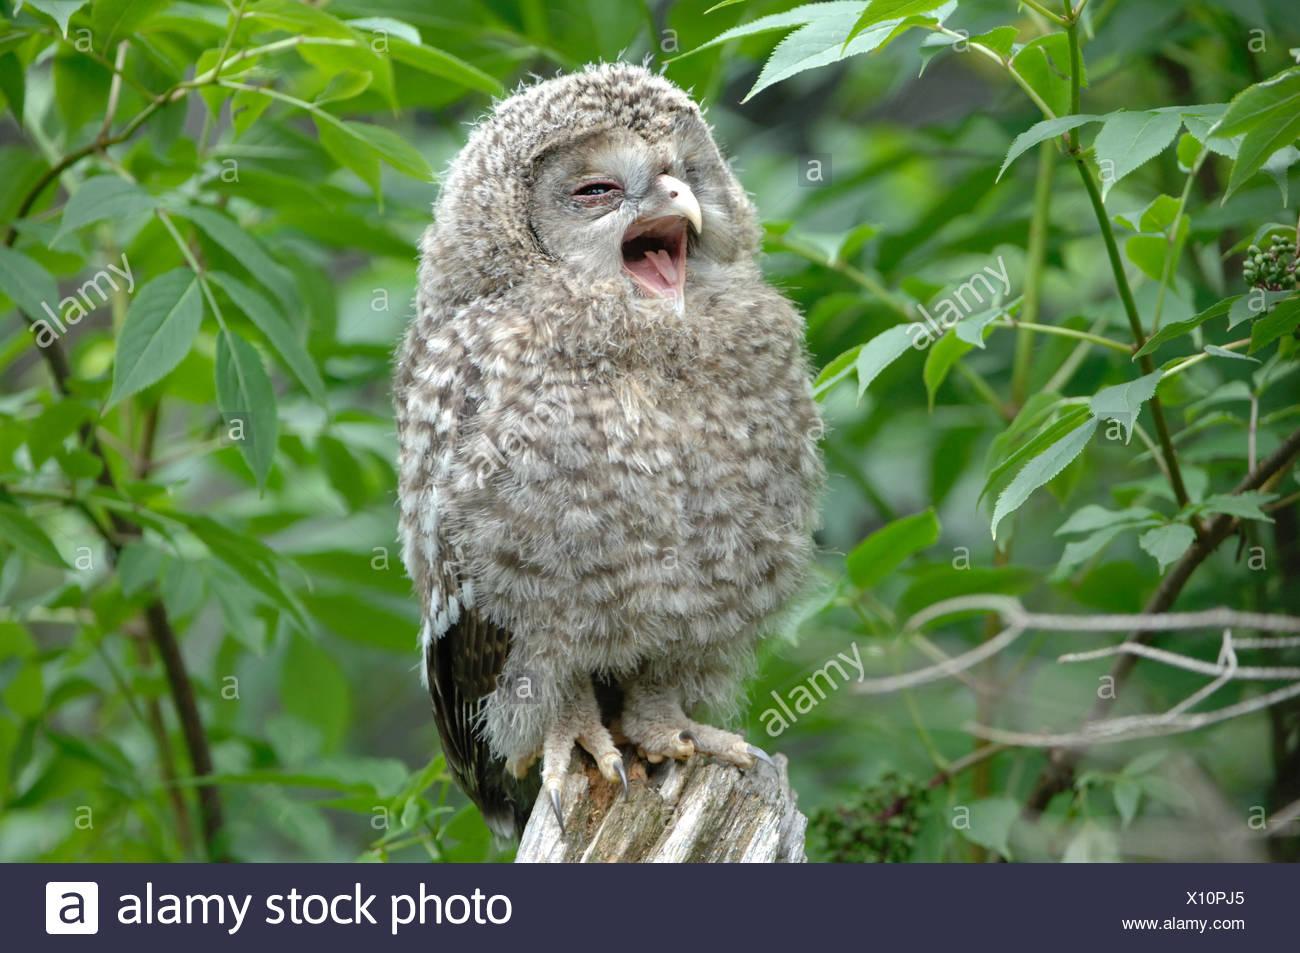 Owls, owl, Ural owl, night hunters, animal, animals, Germany, Europe, - Stock Image